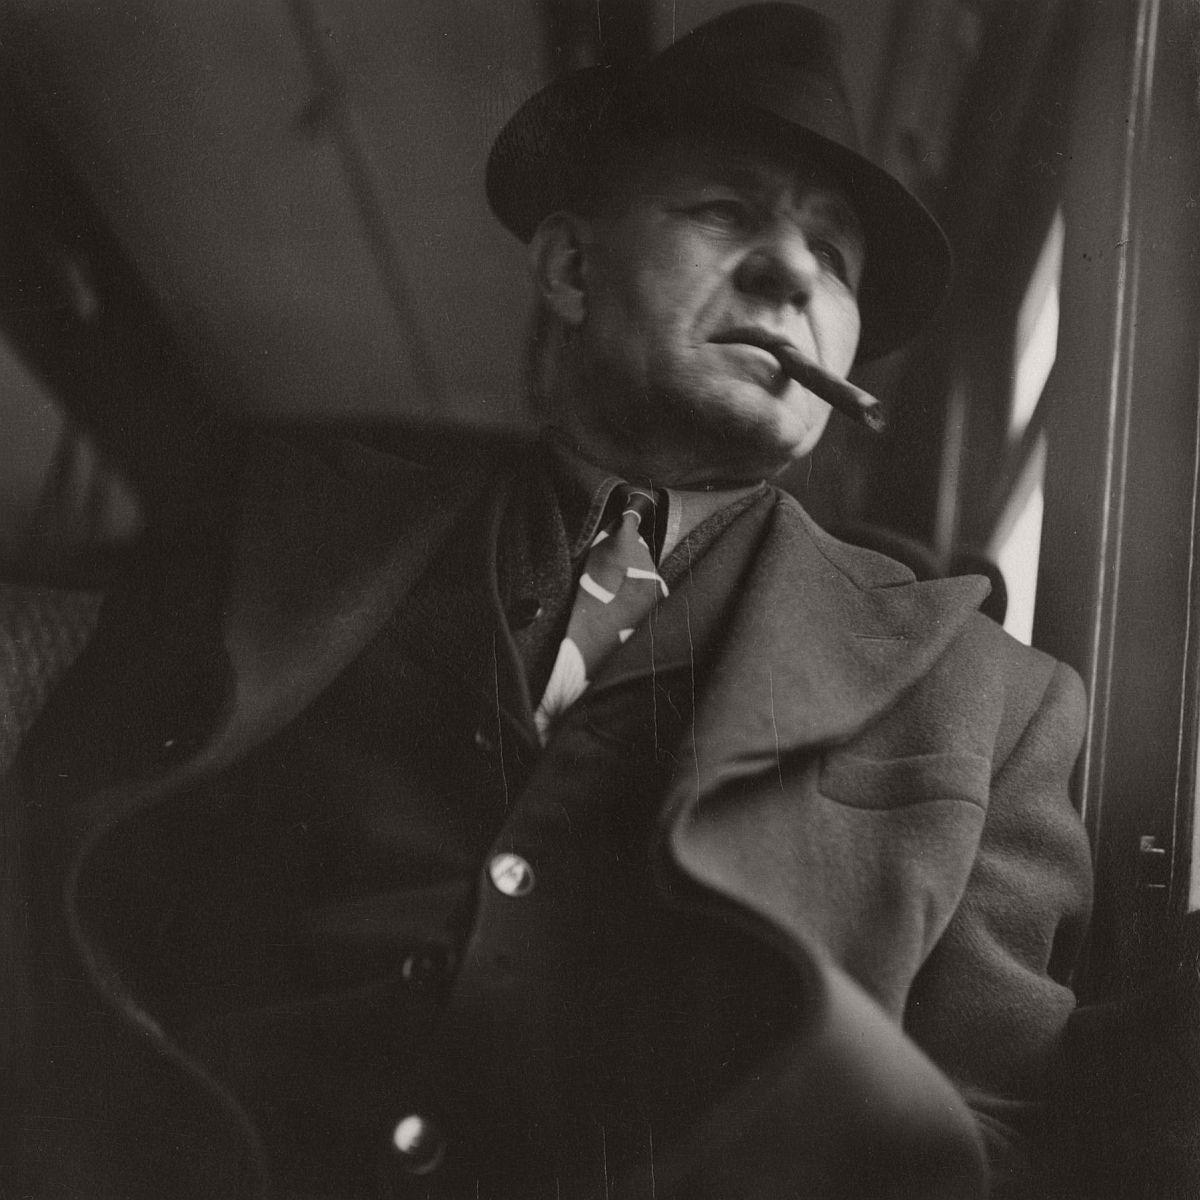 Man with Cigar, 1948